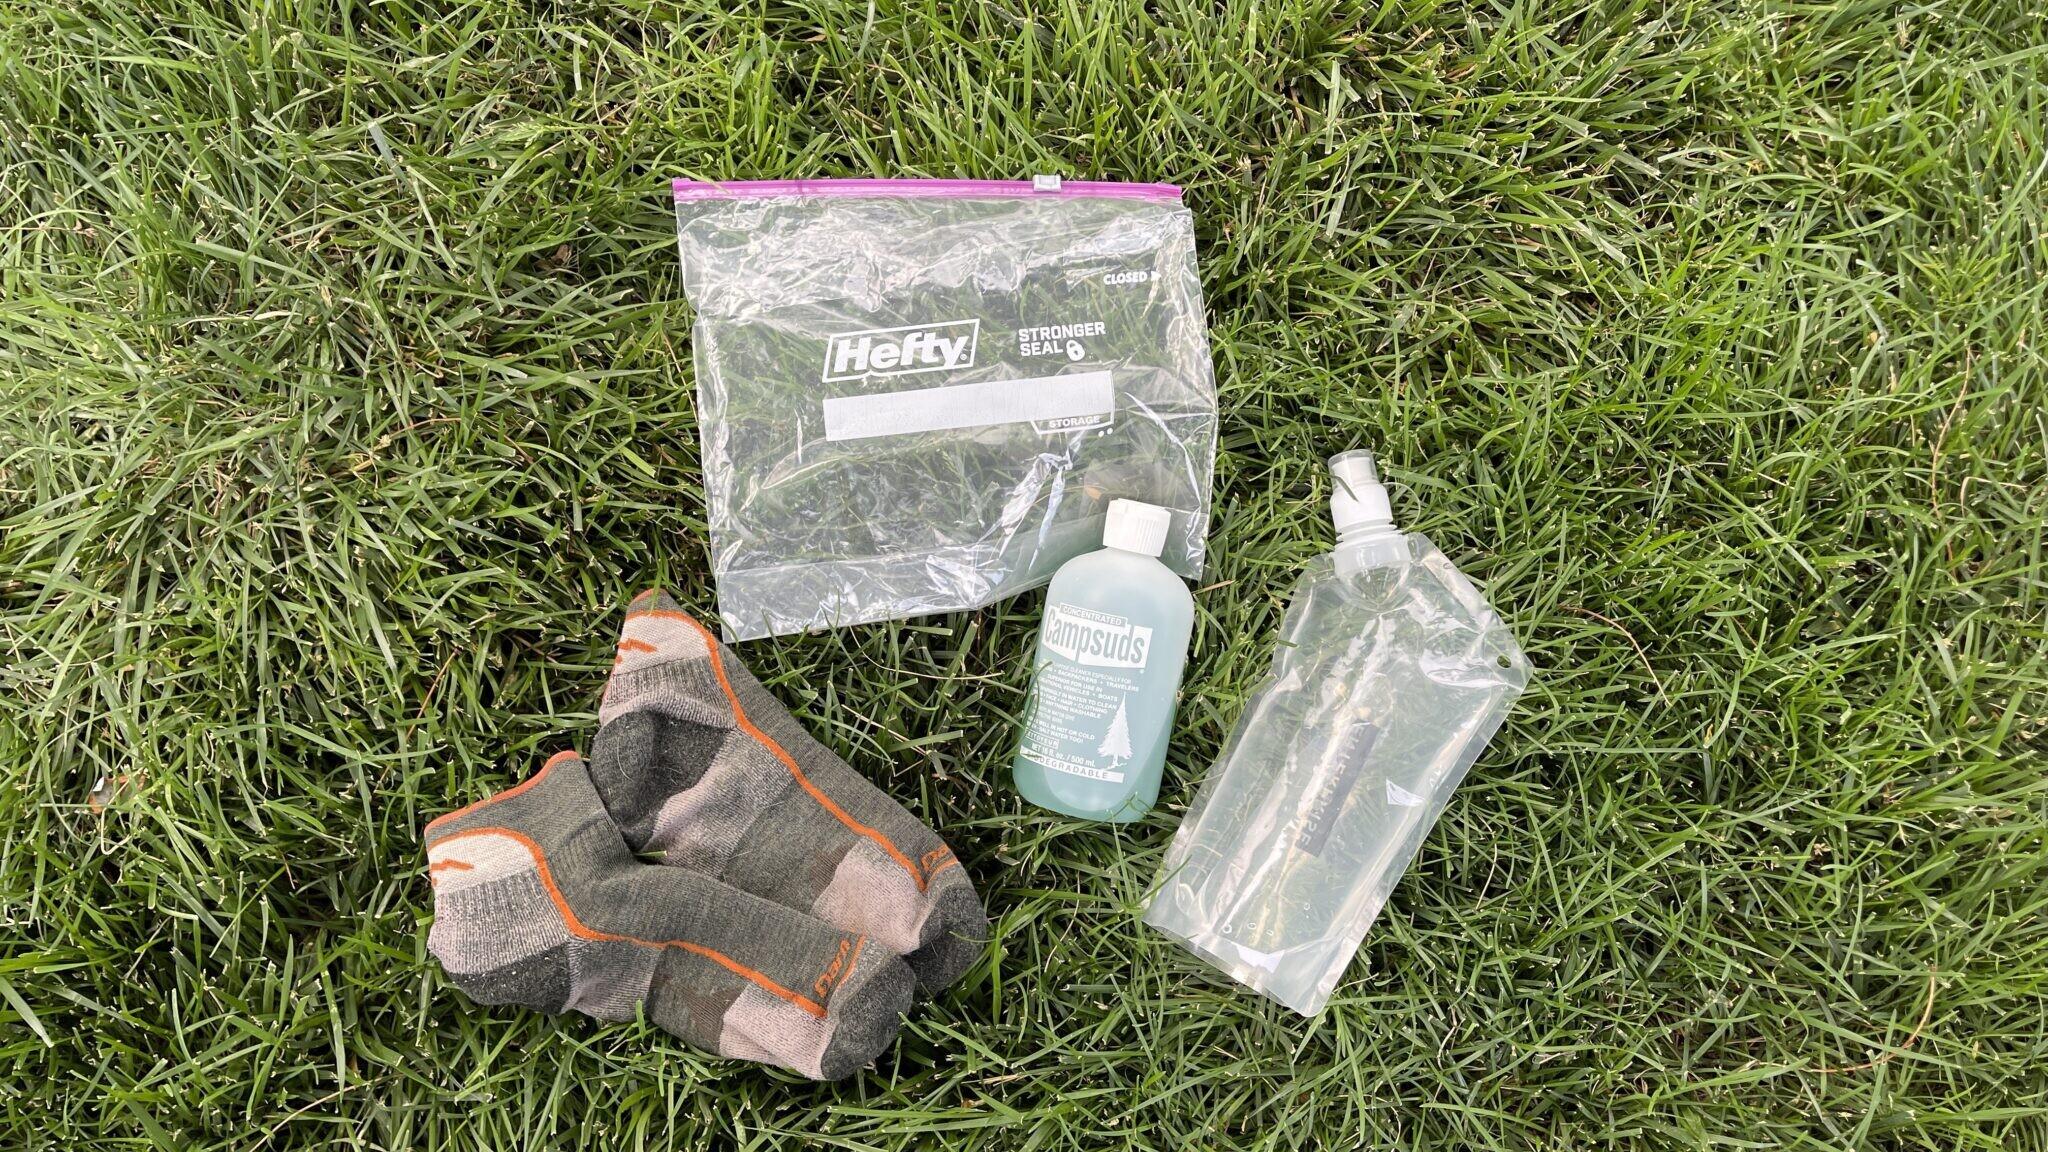 dirty socks, platypus water bottle, hiking detergent, plastic zipl oc bags assorted on grass